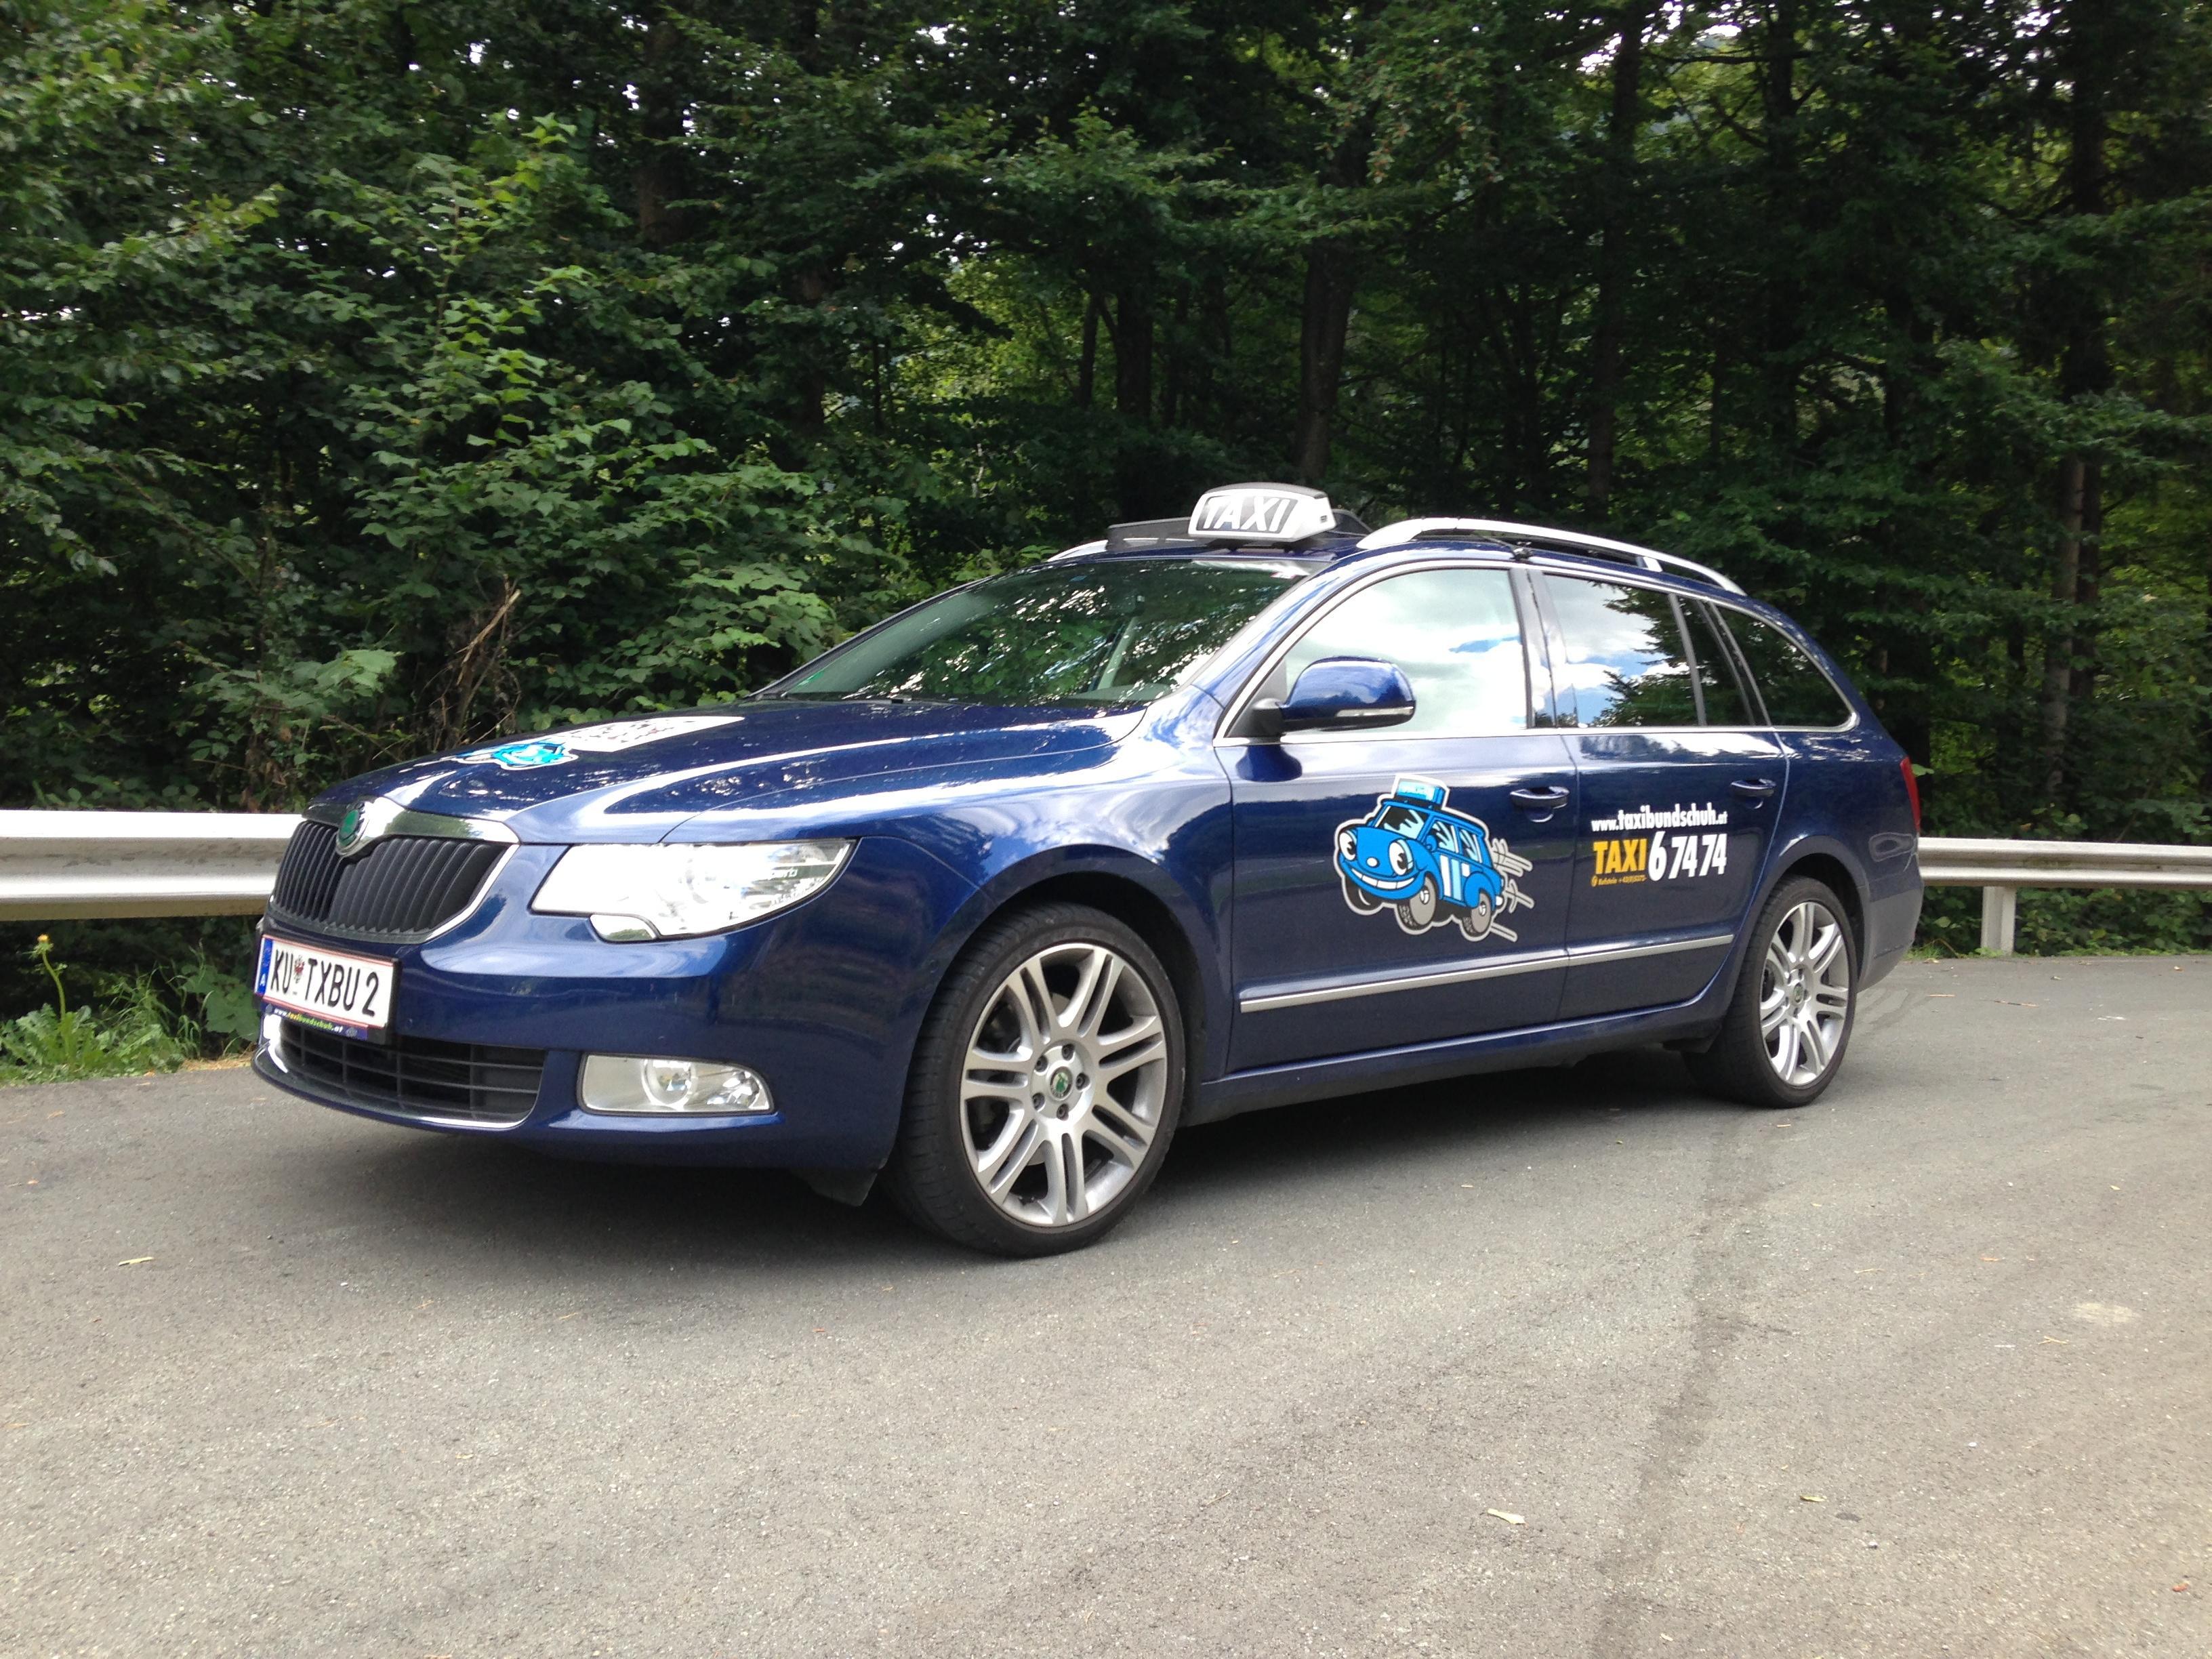 S'Kufstein Taxi 6 74 74 Inh. Harald Bundschuh